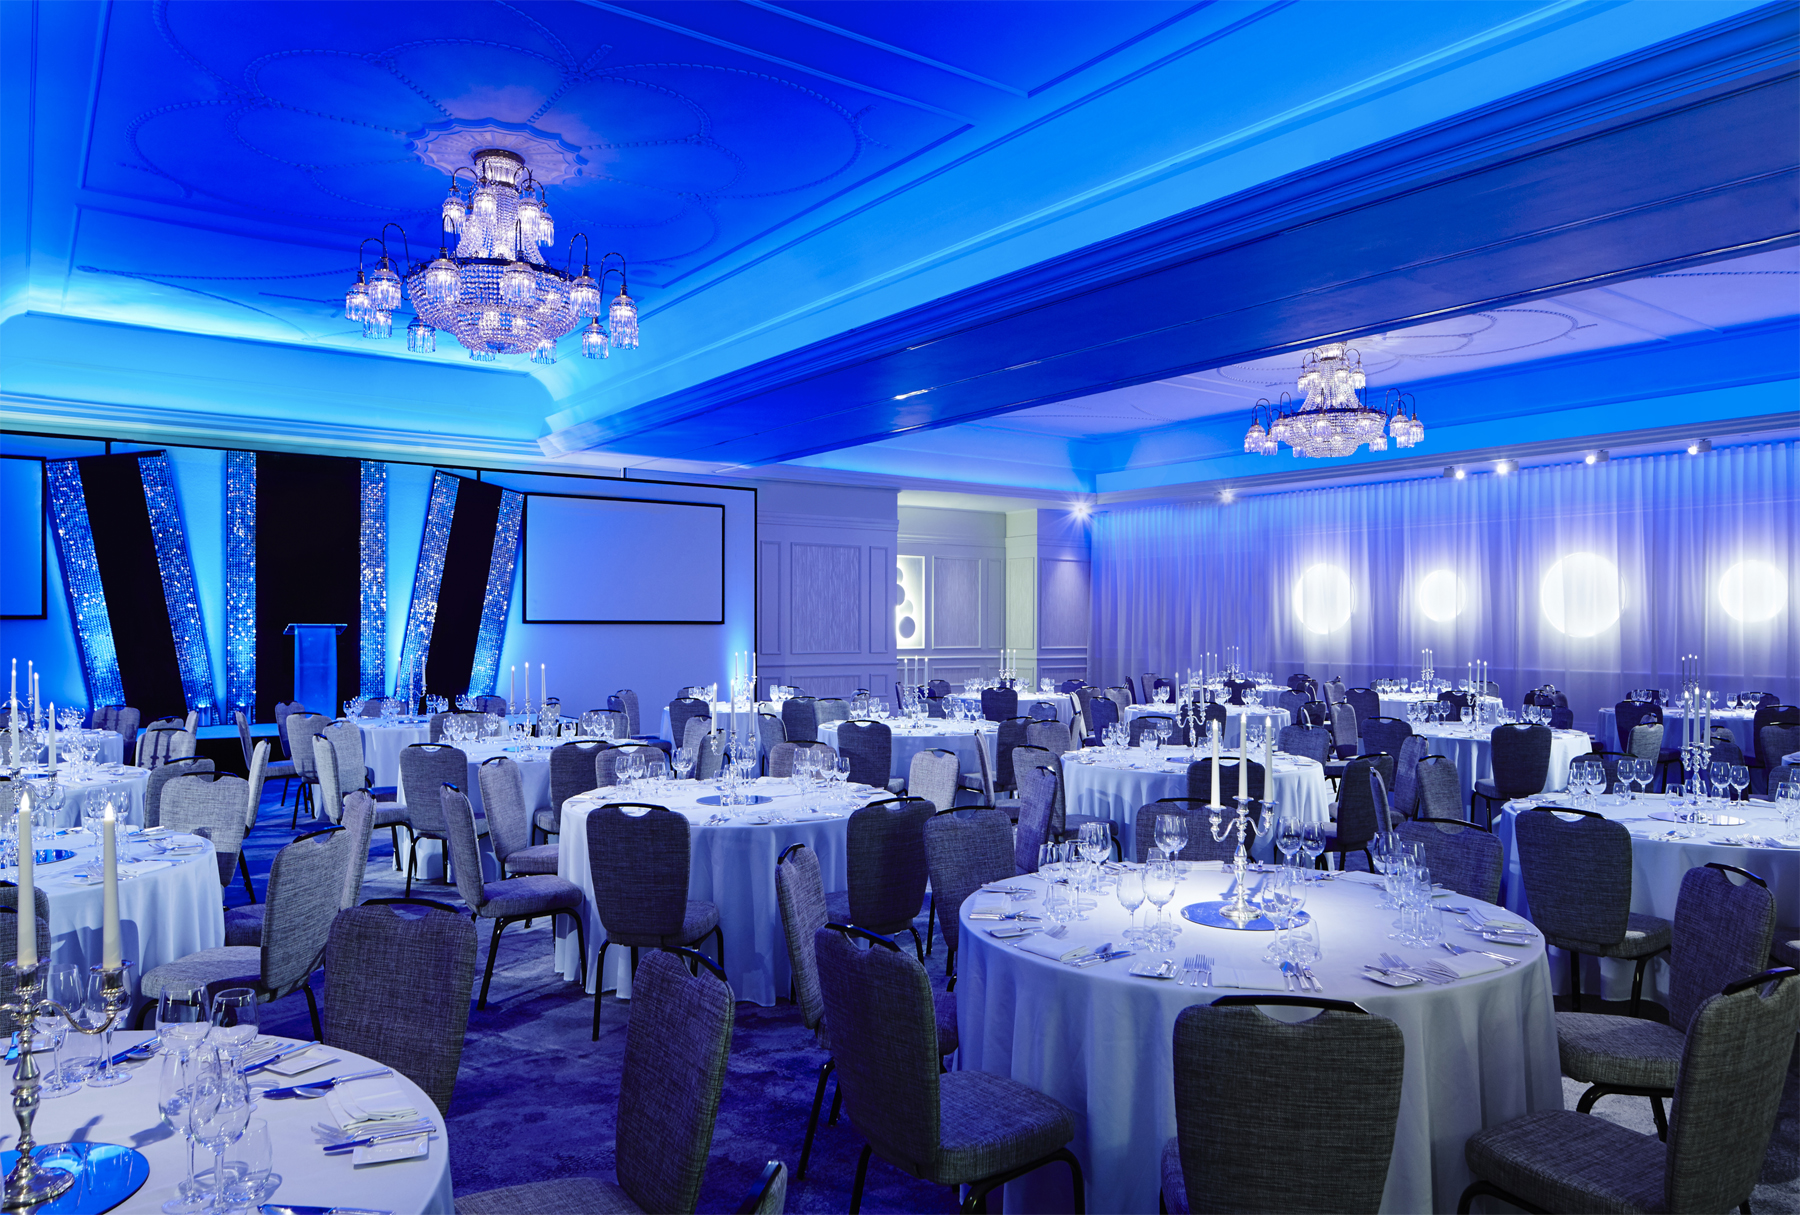 mh-londt-ballroom-awardsdinner1